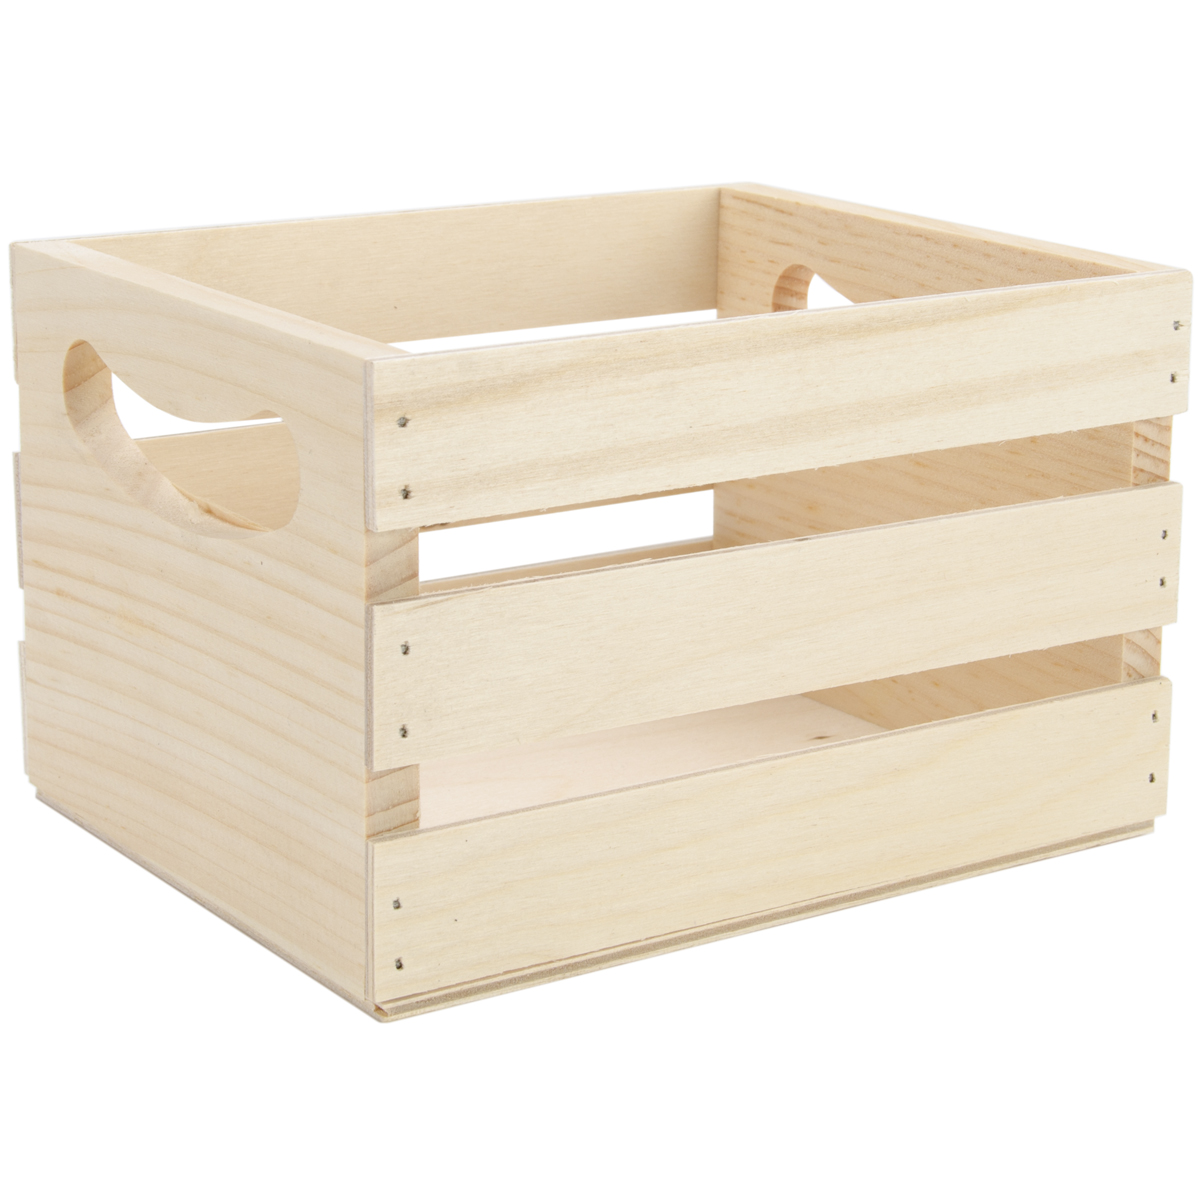 Mini Wooden Crate W Handles 6 5 X5 3 X4 25 Walmart Canada